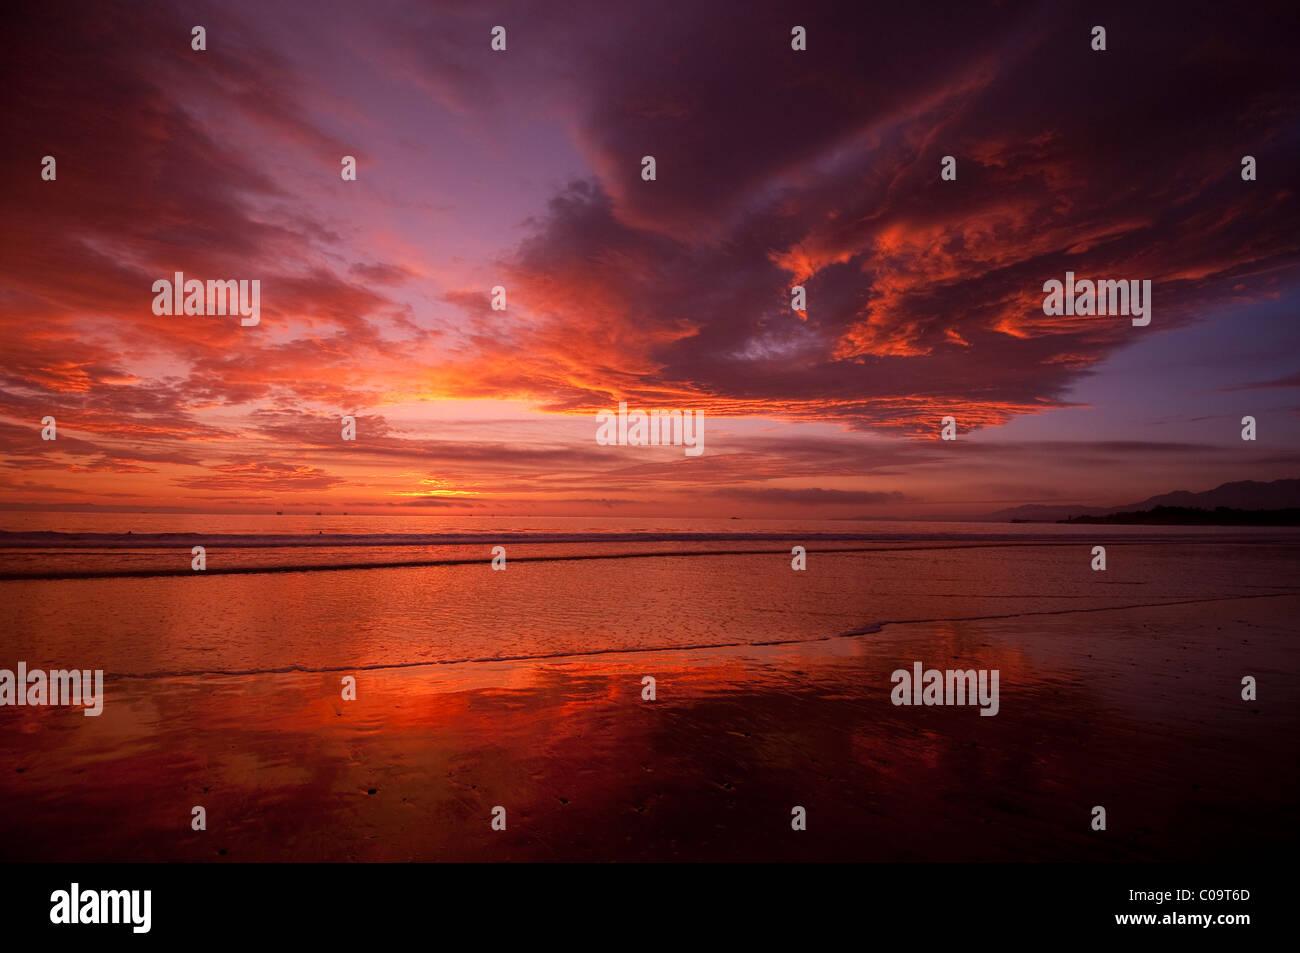 Sunset at west facing beach near Santa Barbara Central California coast - Stock Image